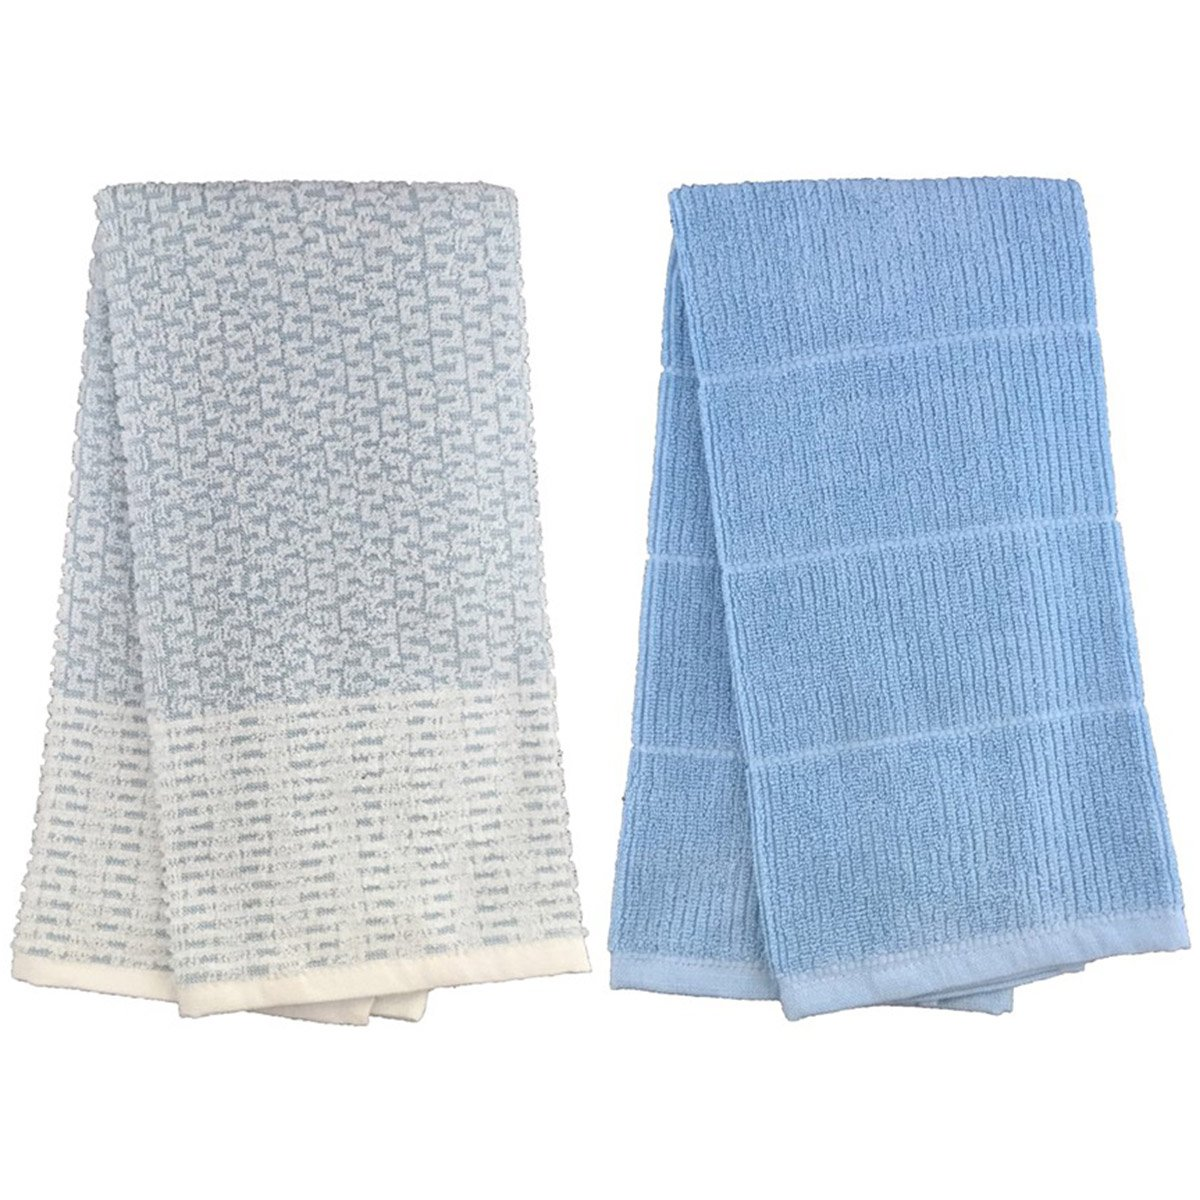 Set of 2, 100% Ringspun Cotton Premium Everyday Lourdes Terry Kitchen Towels Size : 16'' x 27''. (Light Blue)